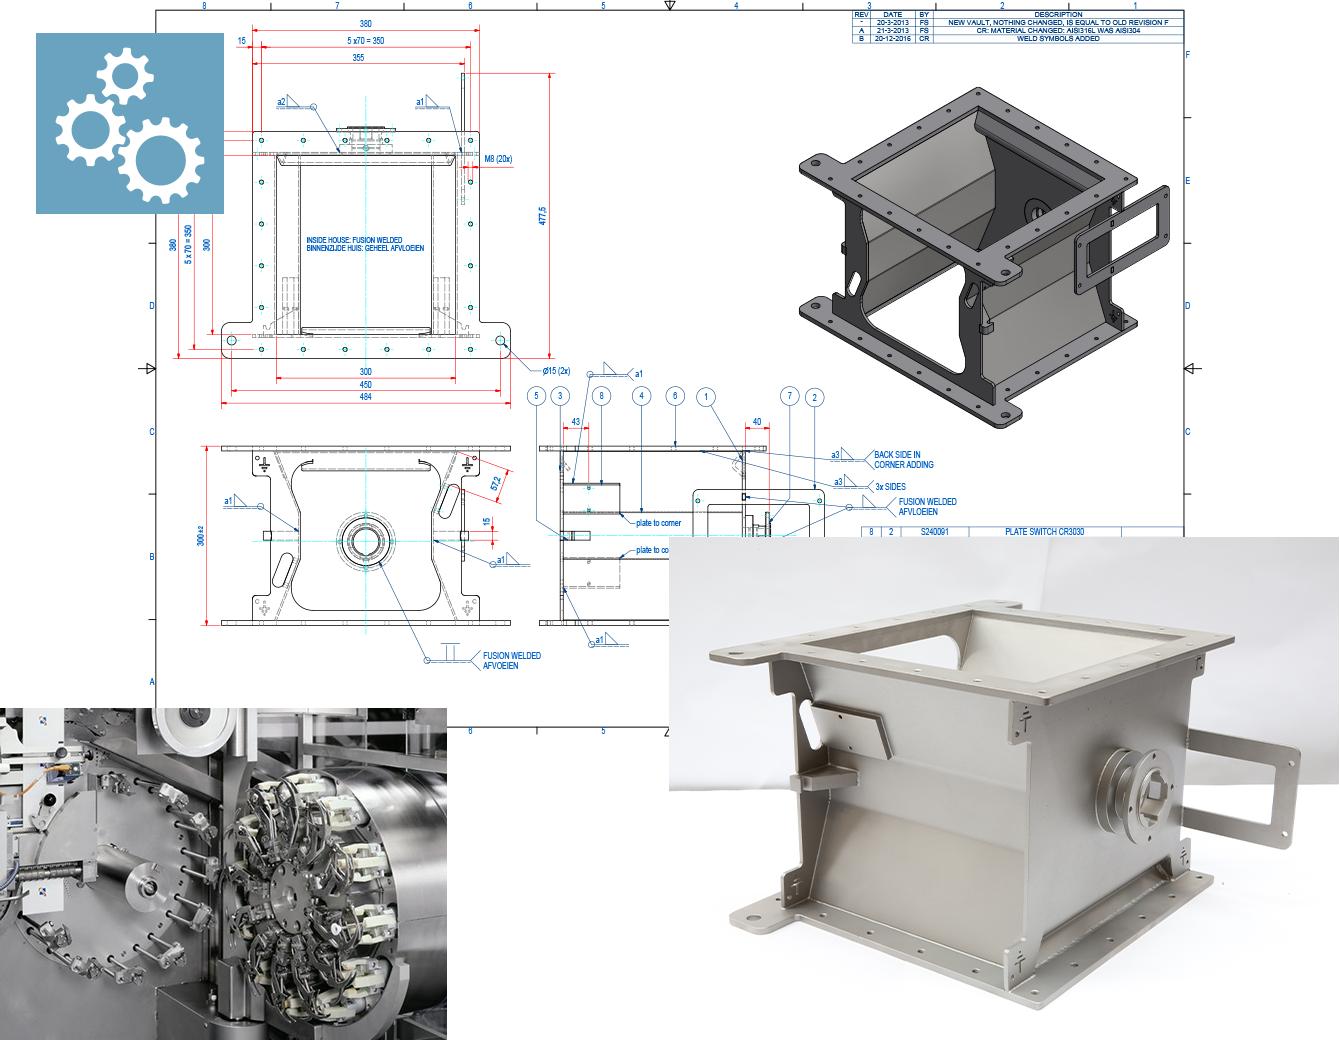 Branches_Machinebouw_v1